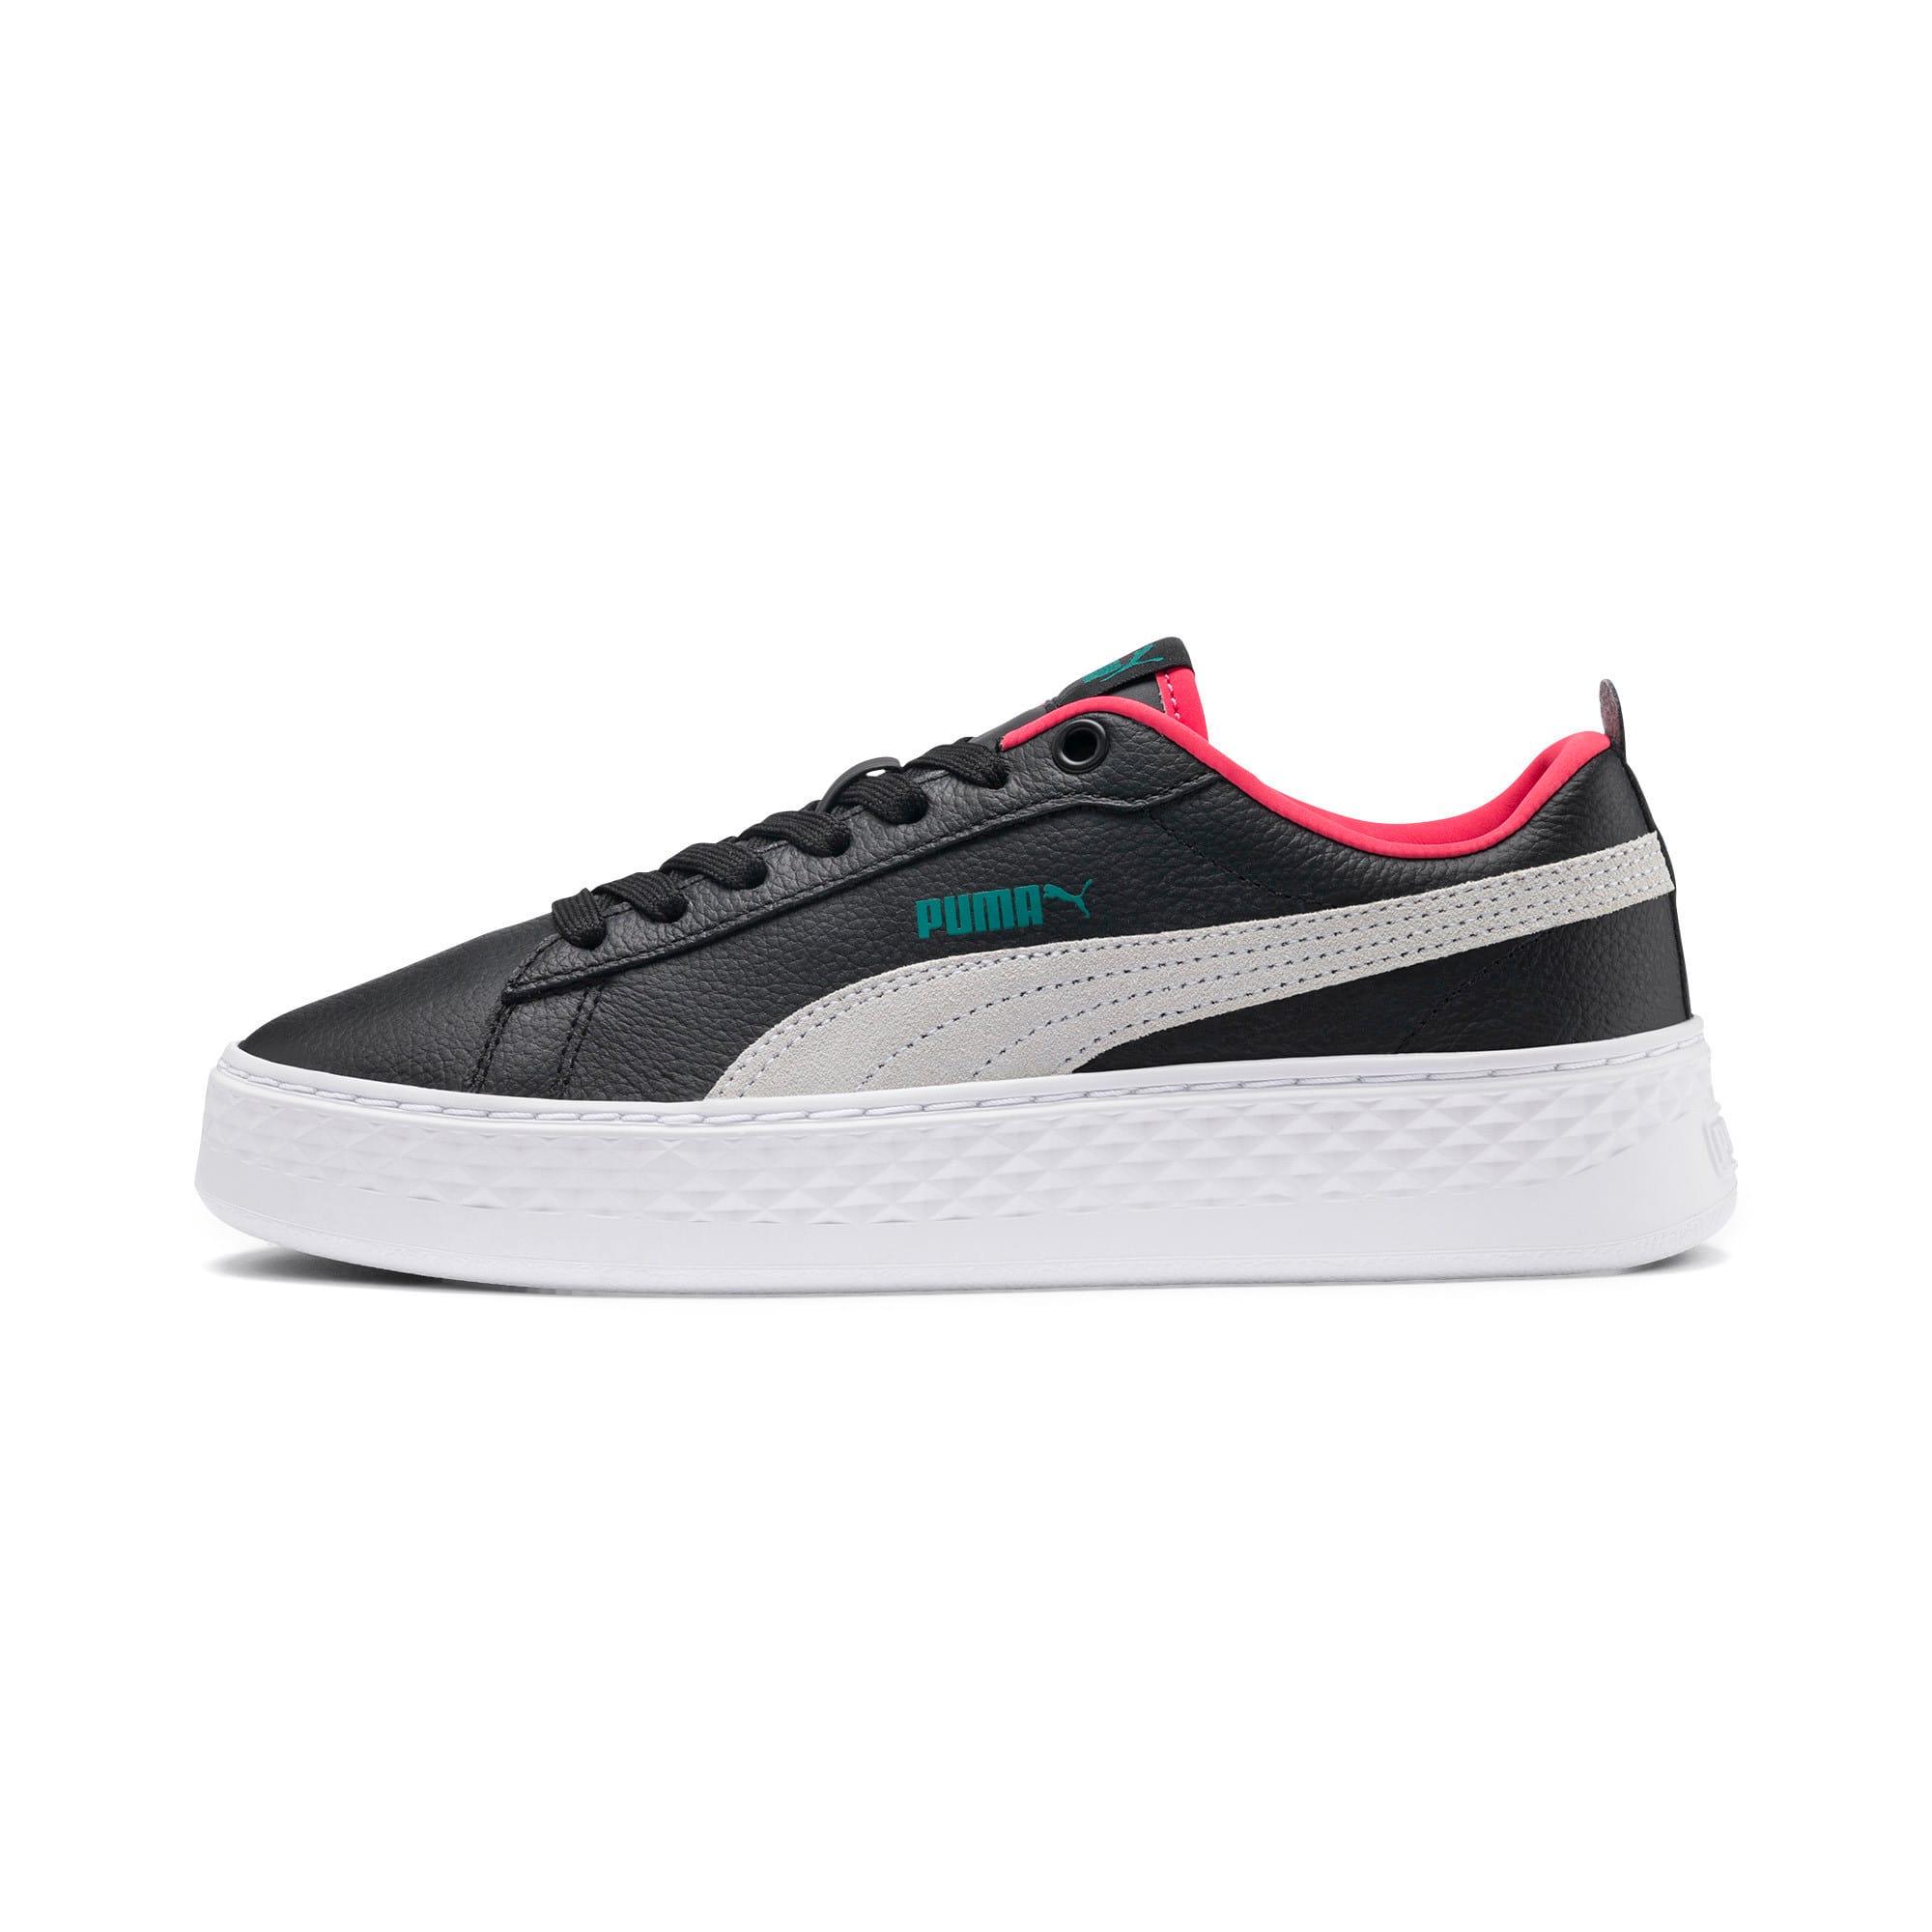 Thumbnail 1 of Puma Smash Platform Women's Shoes, Black-White-T Green-C Coral, medium-IND